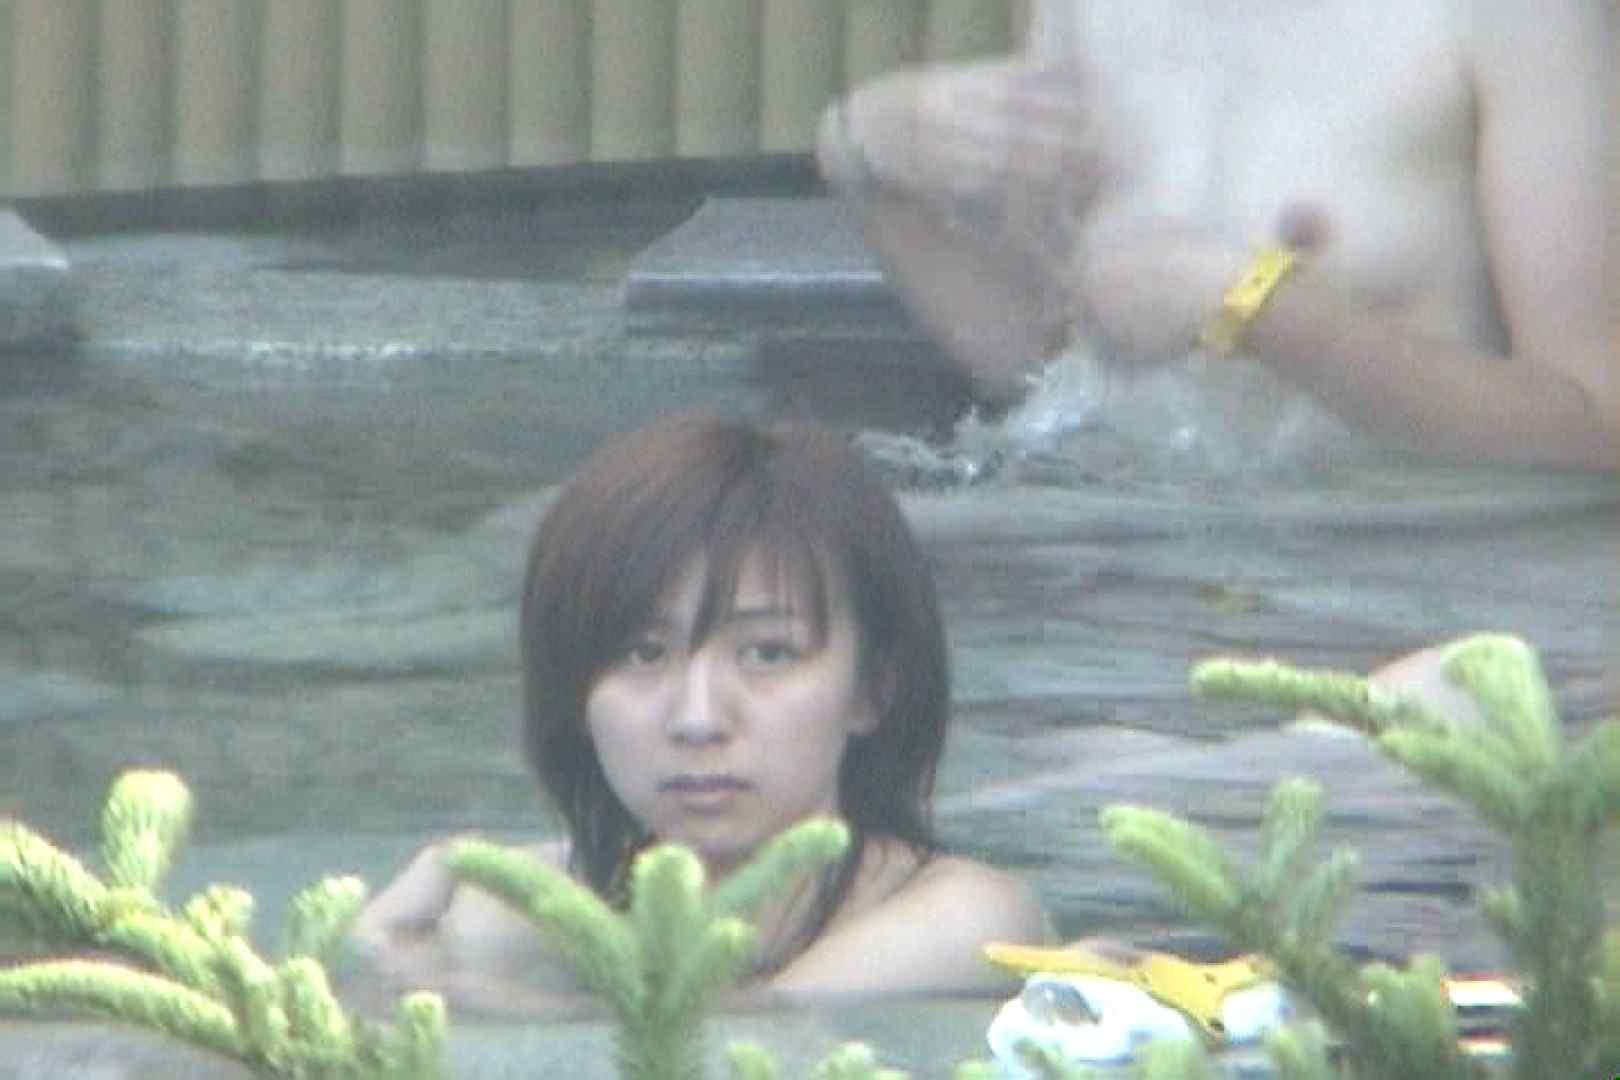 Aquaな露天風呂Vol.77【VIP限定】 盗撮師作品 おまんこ無修正動画無料 96pic 74